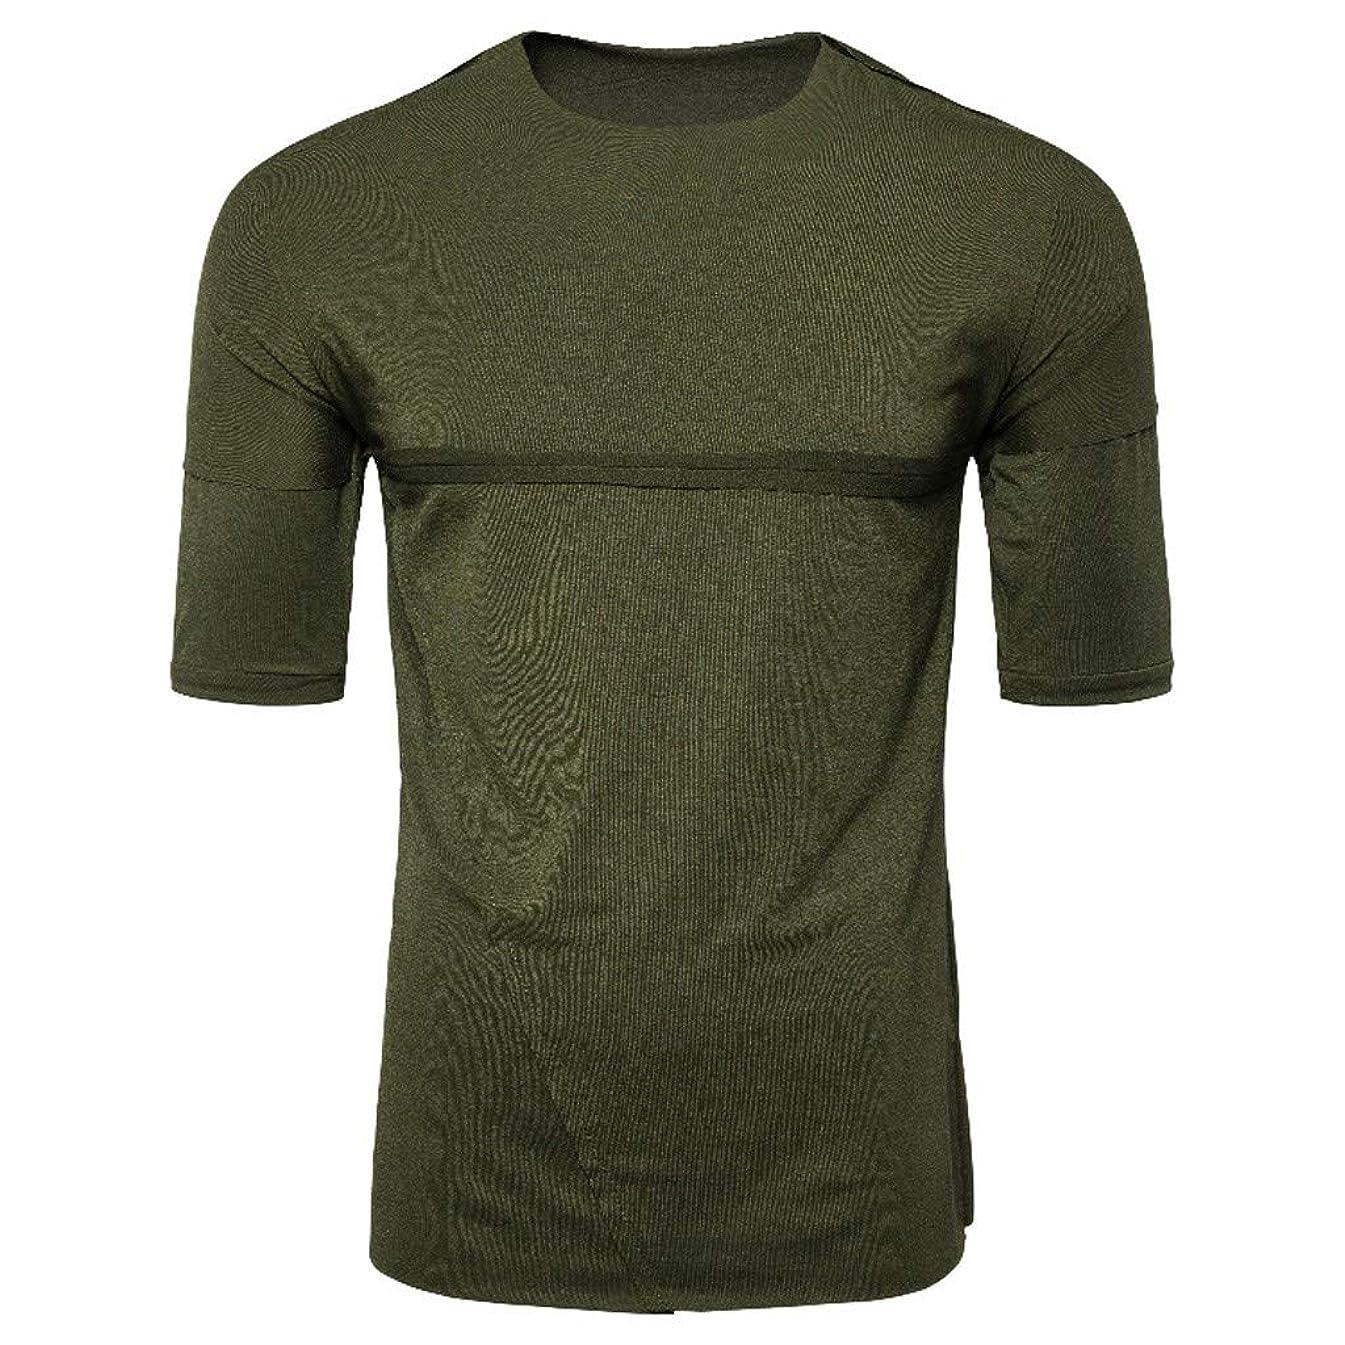 Men's Basic Skins UPF 50+ Short Sleeve Sun Shirt Plain Crew Neck T-Shirt